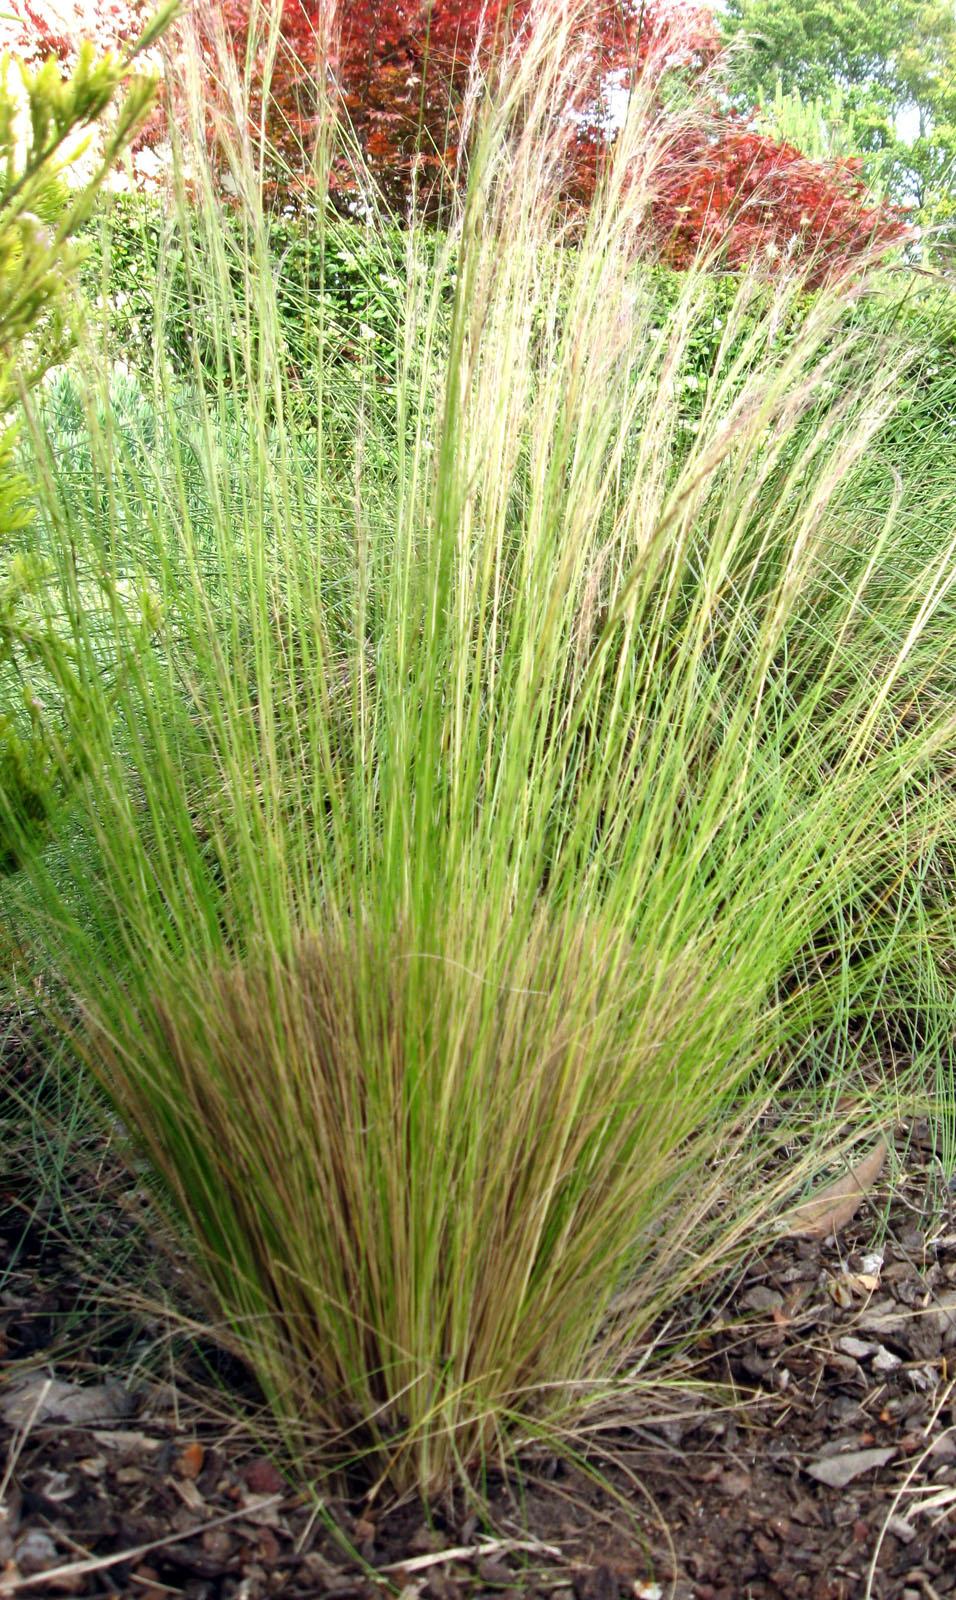 DryStoneGarden » Blog Archive » Maintaining Ornamental Grasses